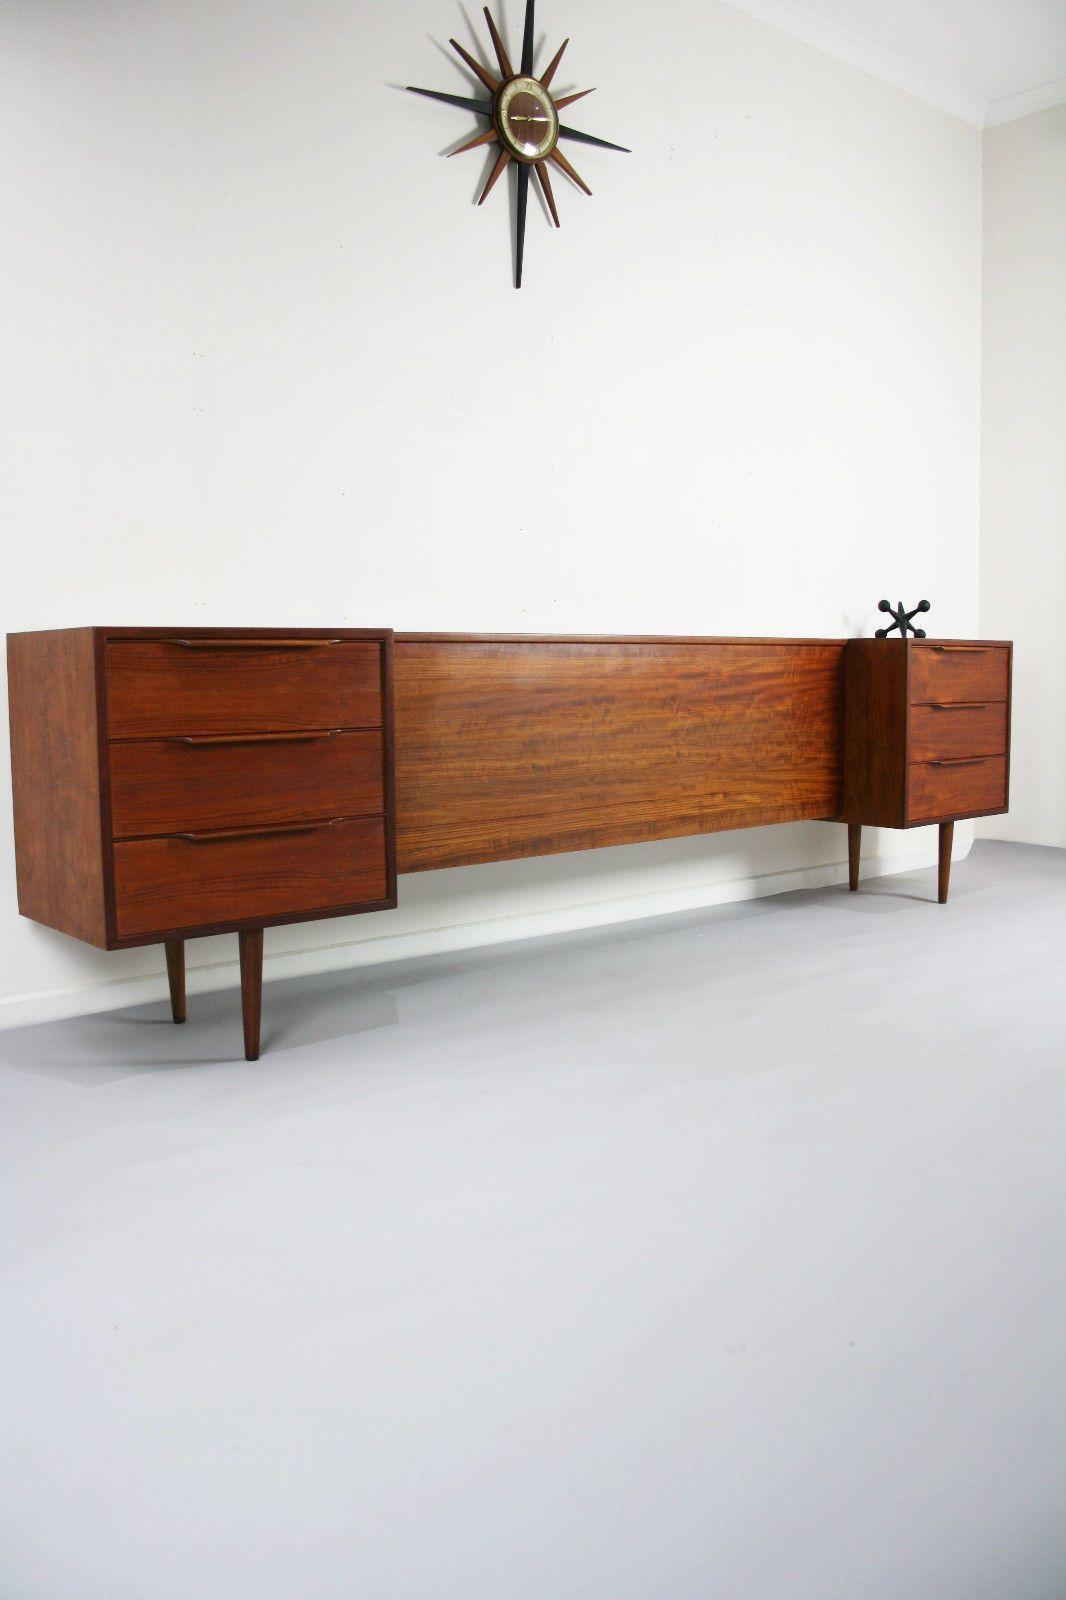 MID Century Bedside Tables Drawers QB Bedhead Retro Vintage Hayson ...